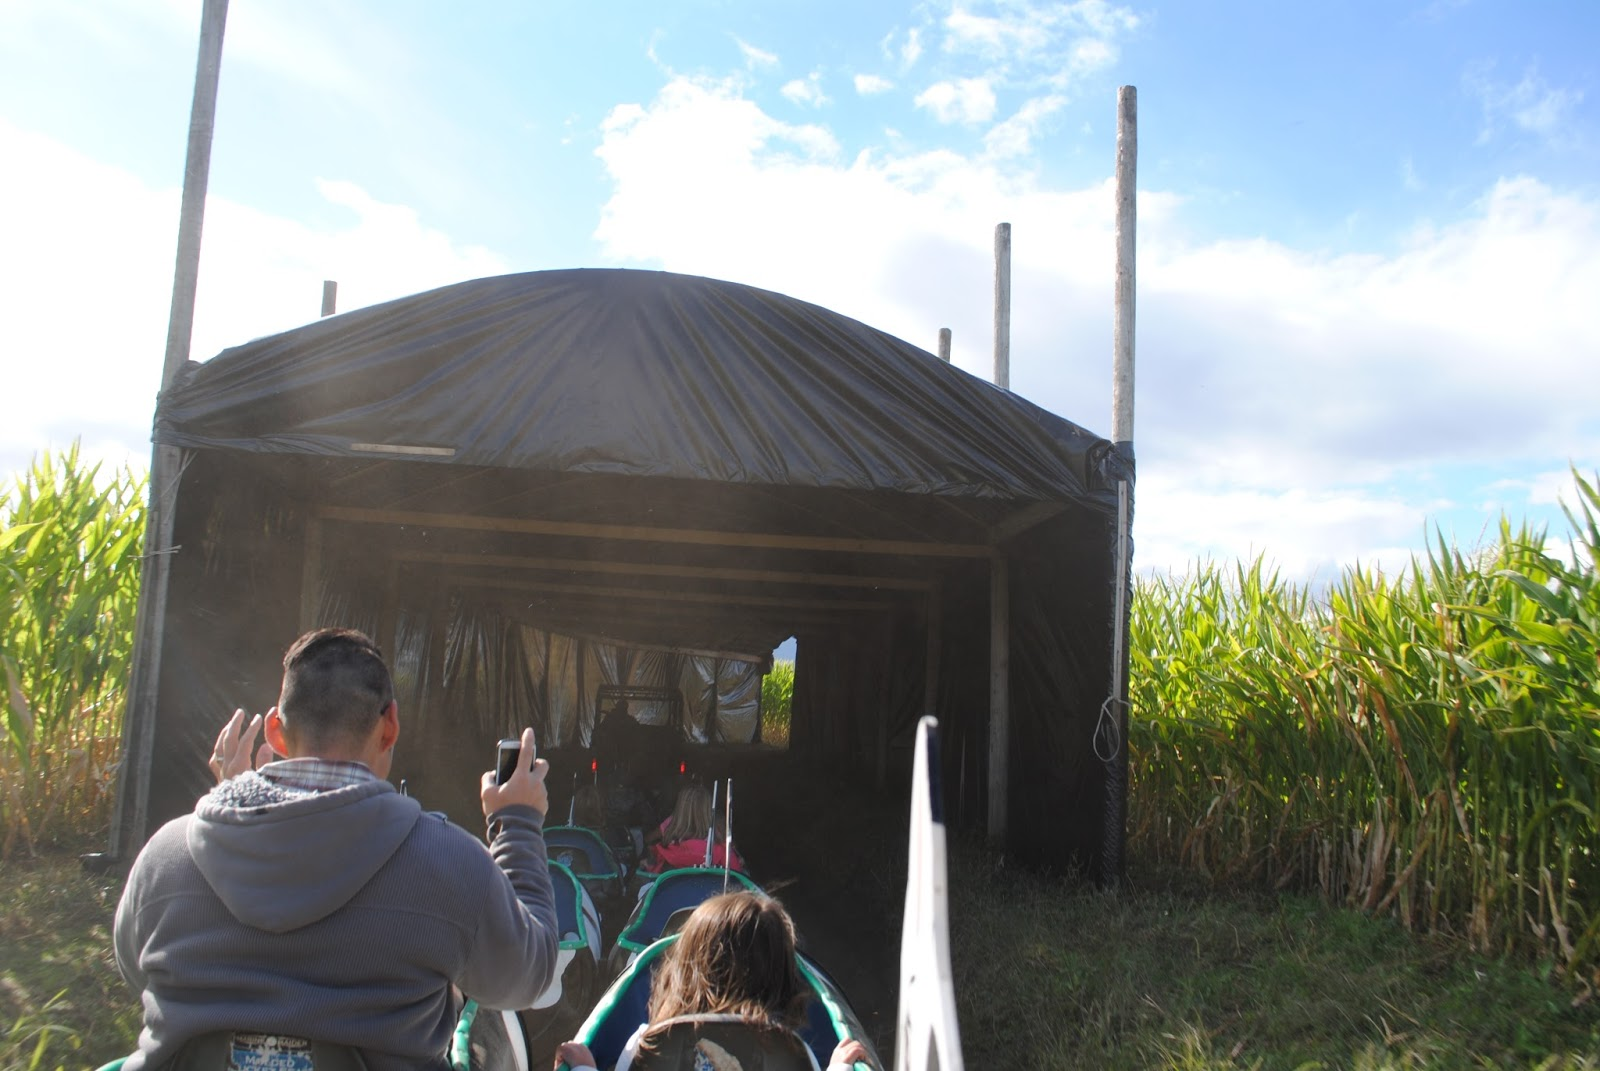 Fort Vannoy Farms Harvest Festival - Grants Pass, Oregon - Josephine County - Rogue Valley - Southern Oregon - Fall - Autumn - Pumpkin Patch - Corn Maze - Hayrides (135).JPG